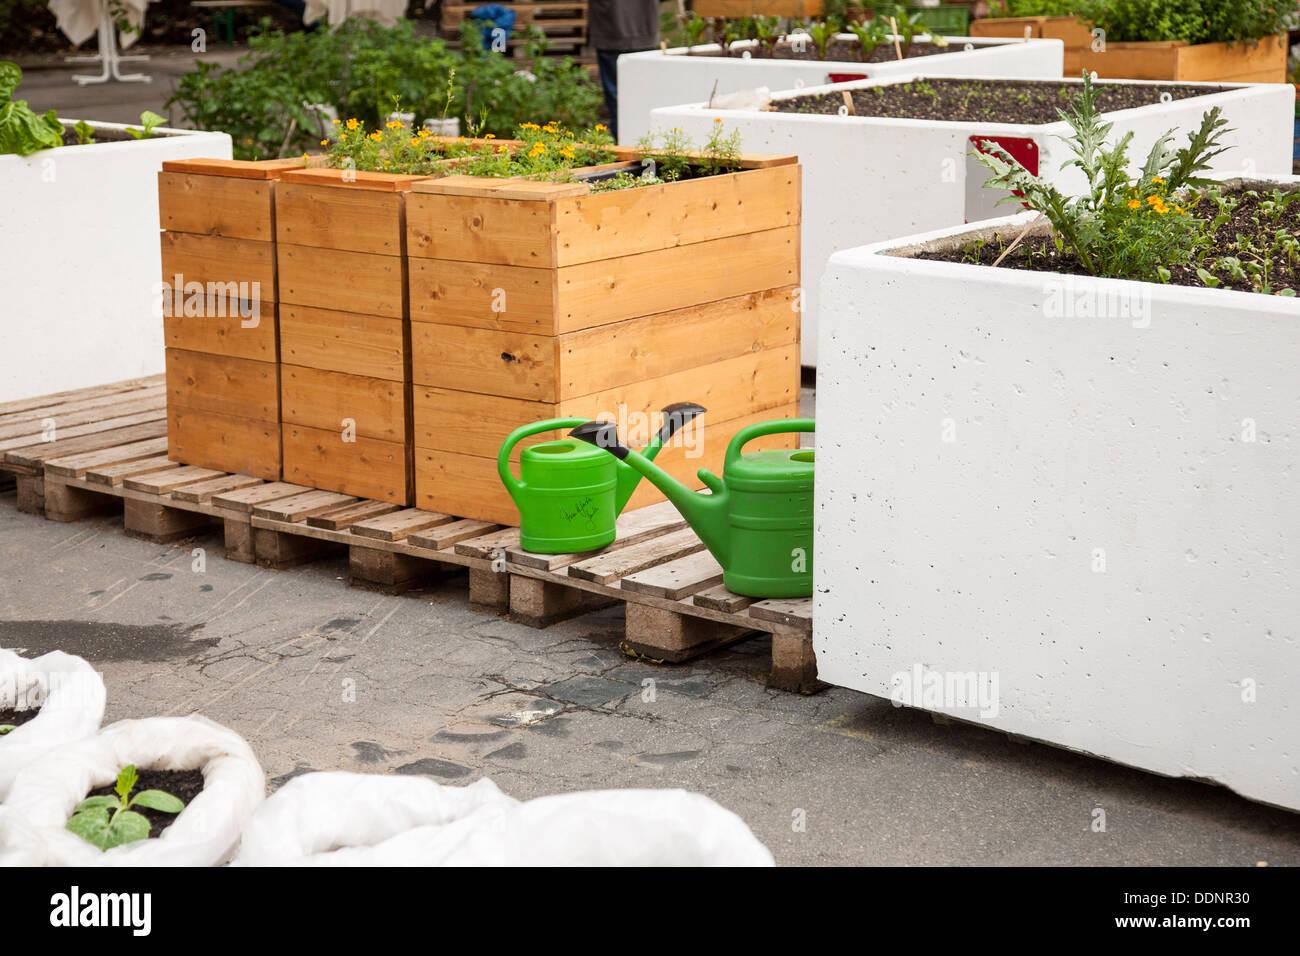 Il giardinaggio urbano, Frankfurt am Main, Hesse, Germania, Europa Immagini Stock